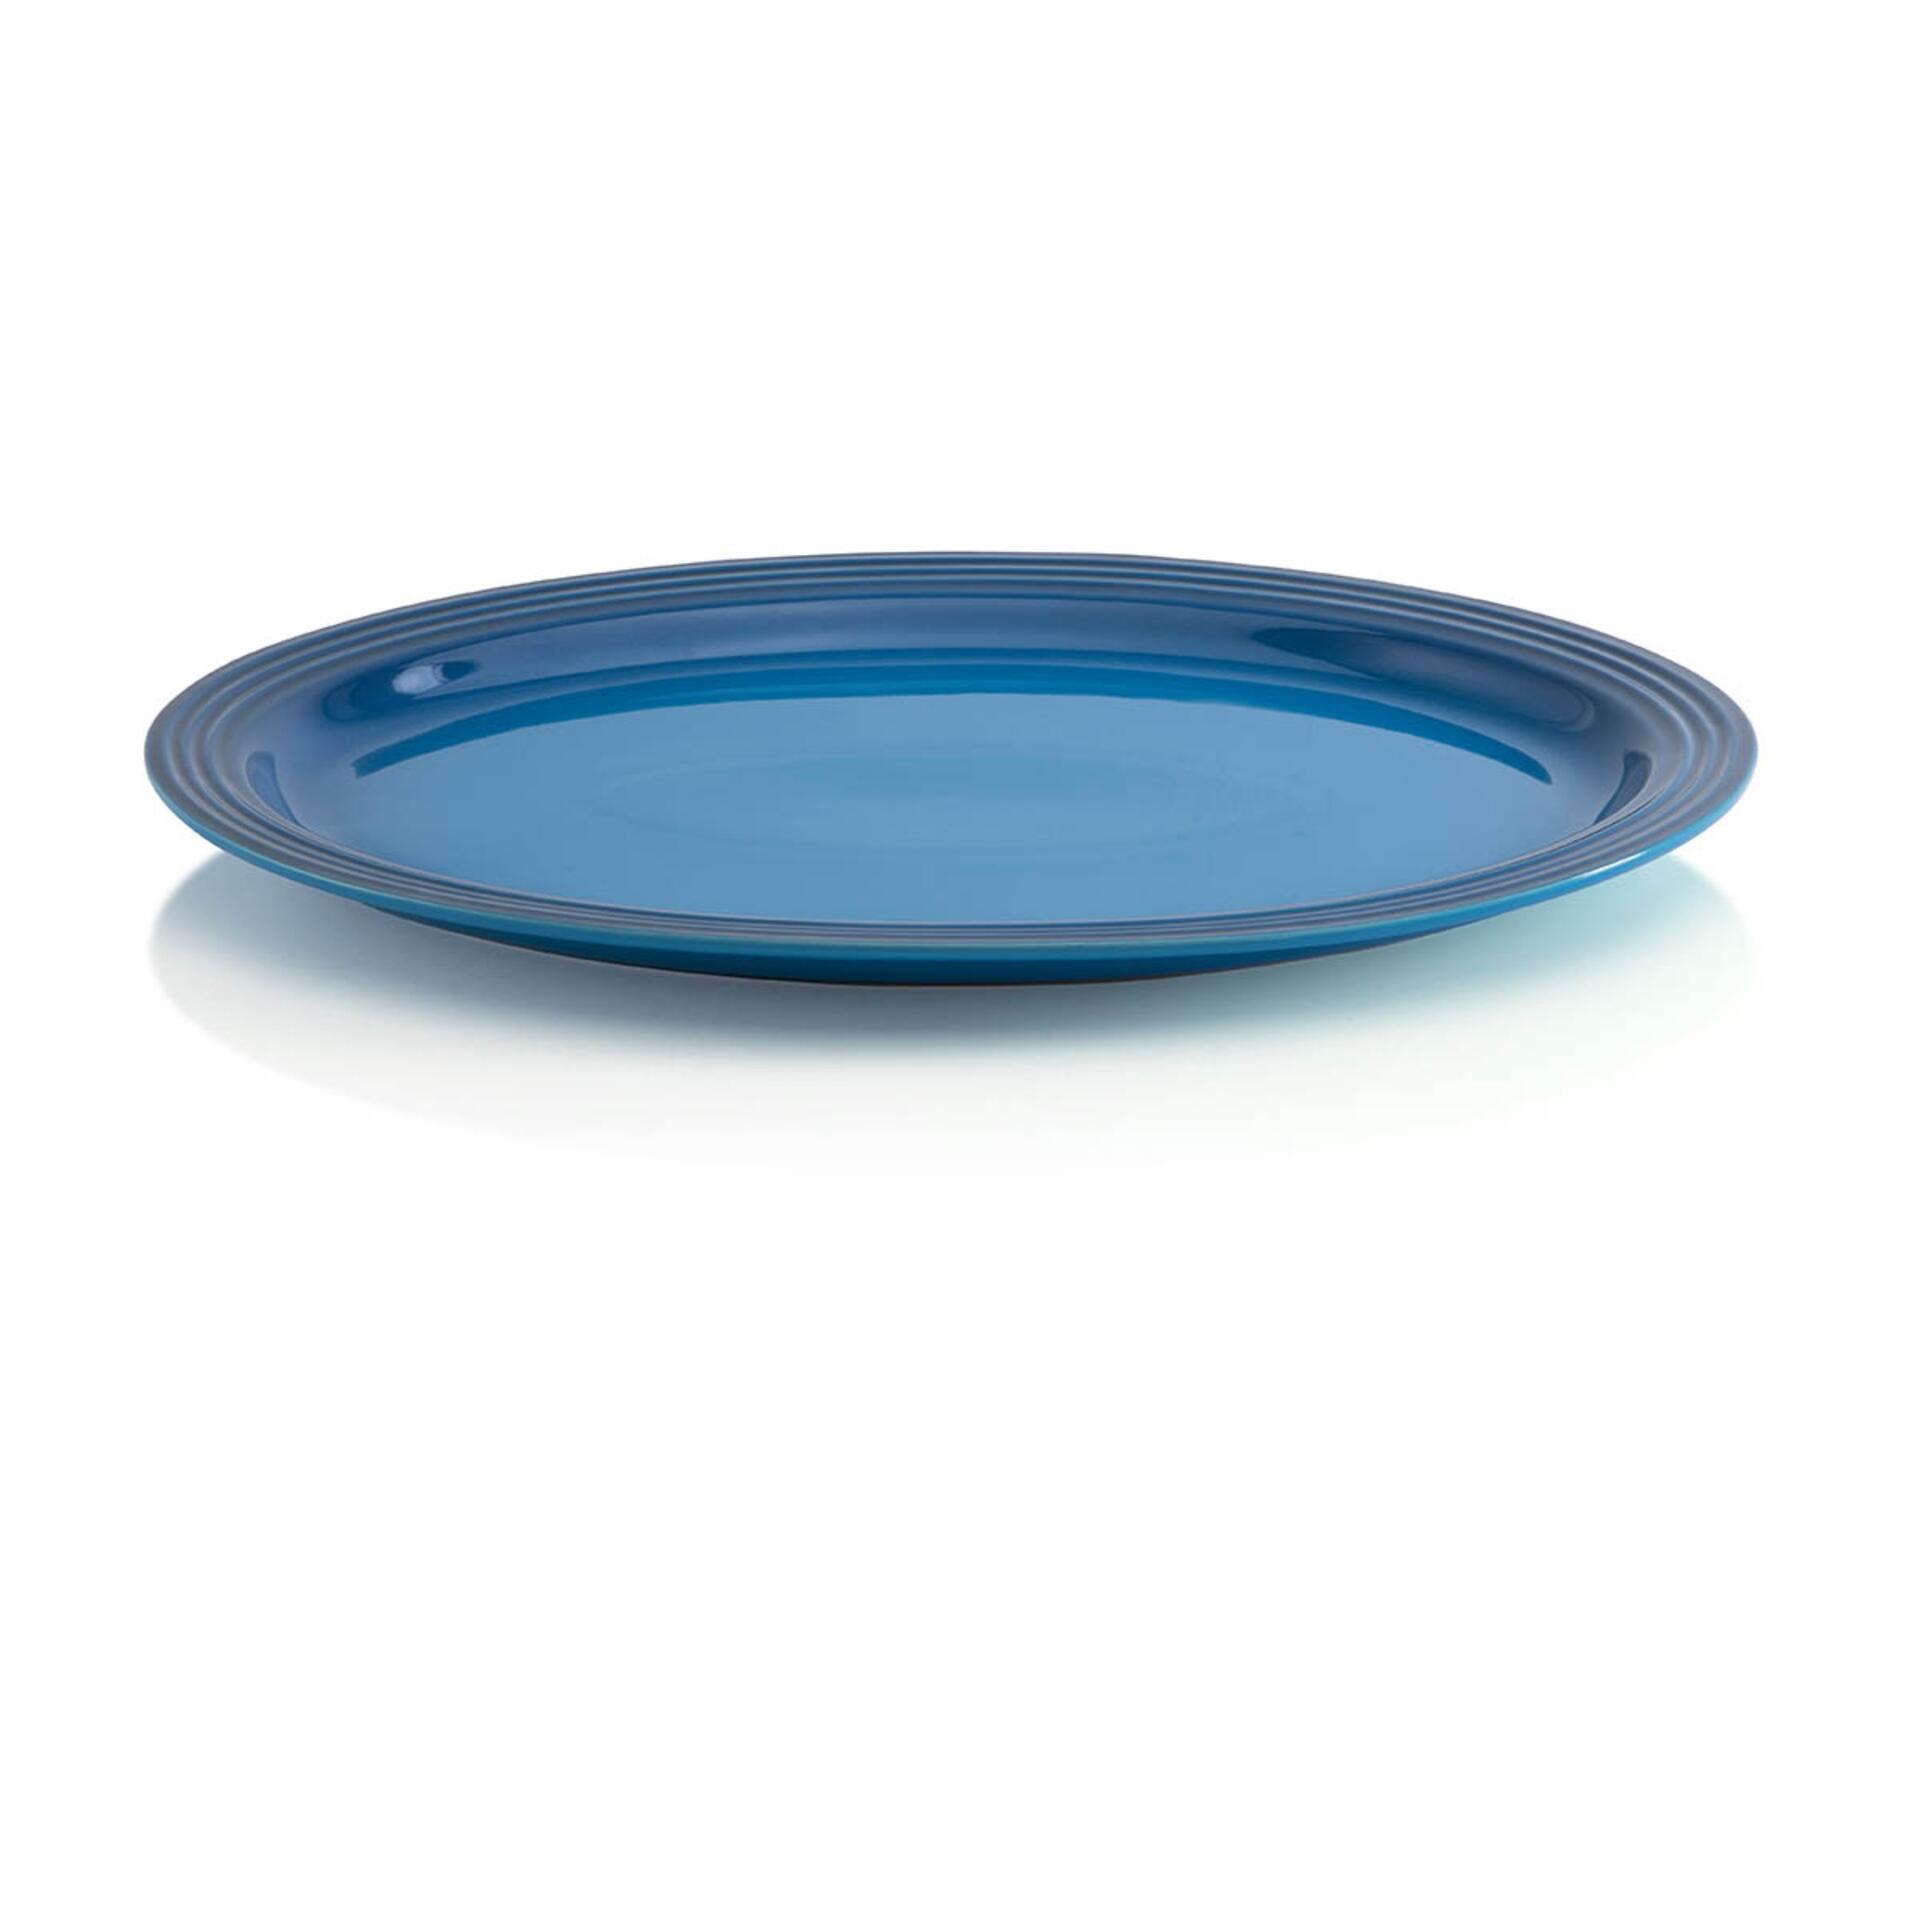 Le Creuset Servierplatte oval 46 cm Marseille